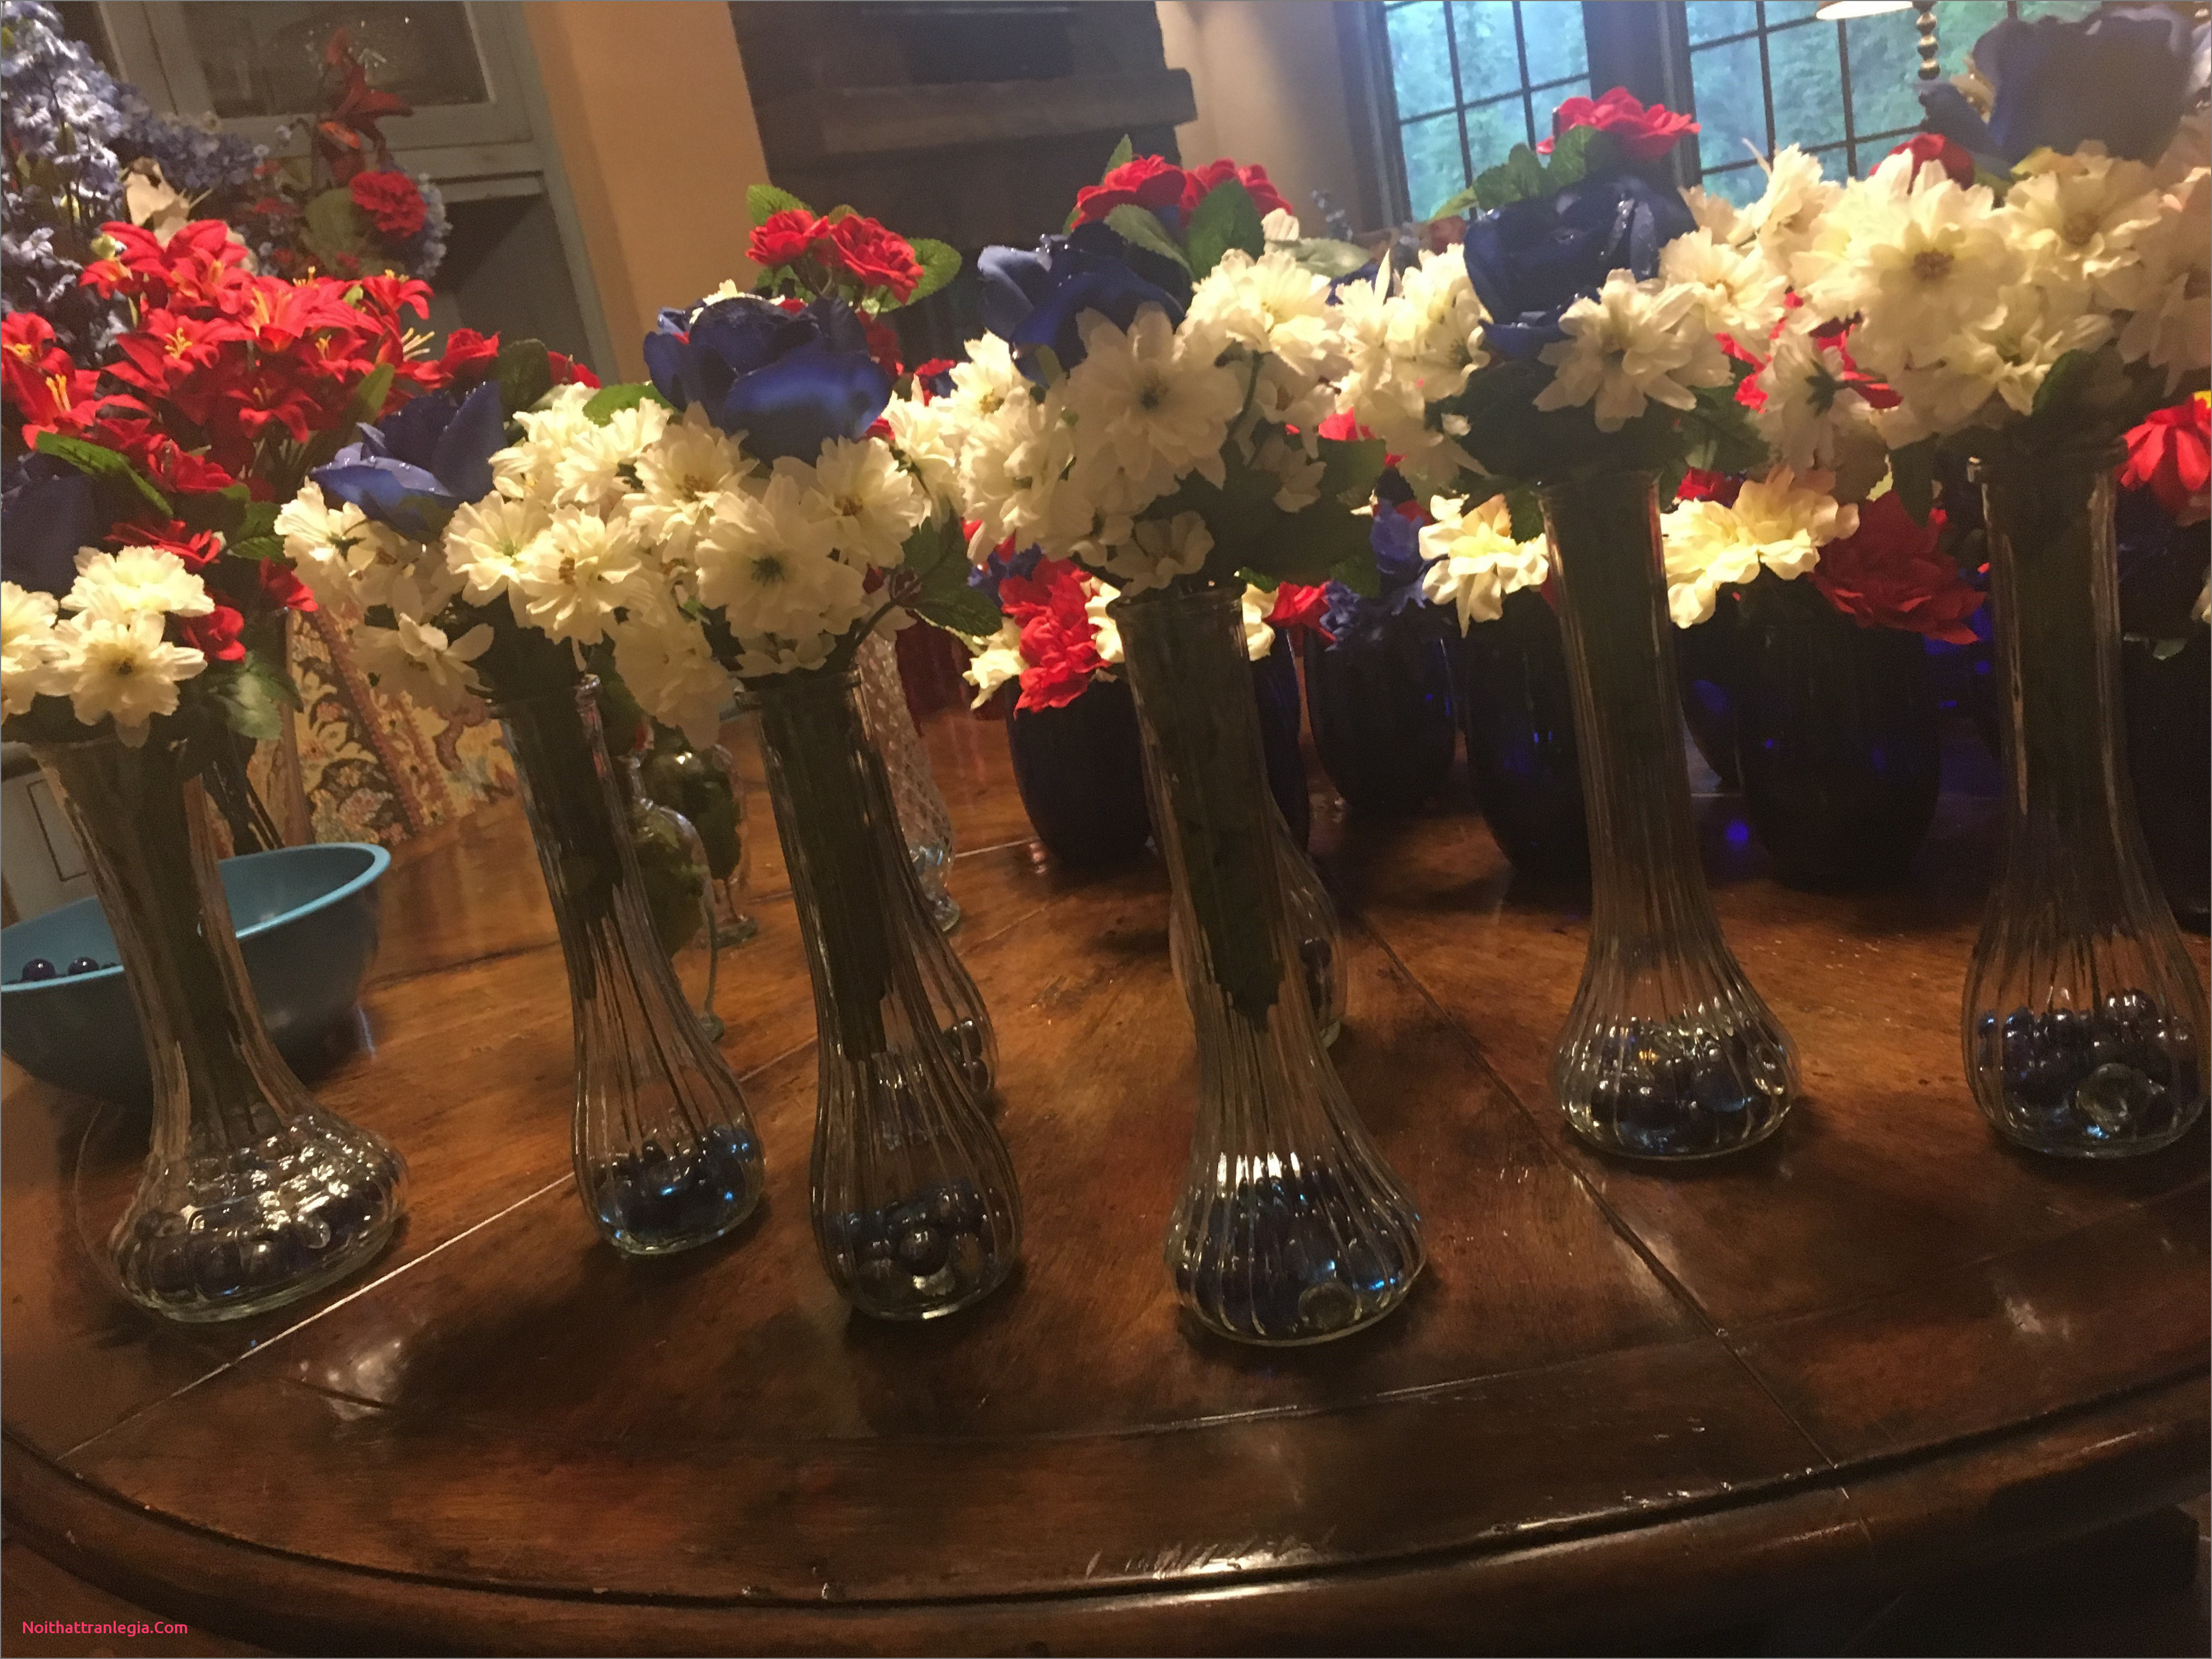 large vases for living room of 20 wedding vases noithattranlegia vases design with decoration line luxury dollar tree wedding decorations awesome h vases dollar vase i 0d